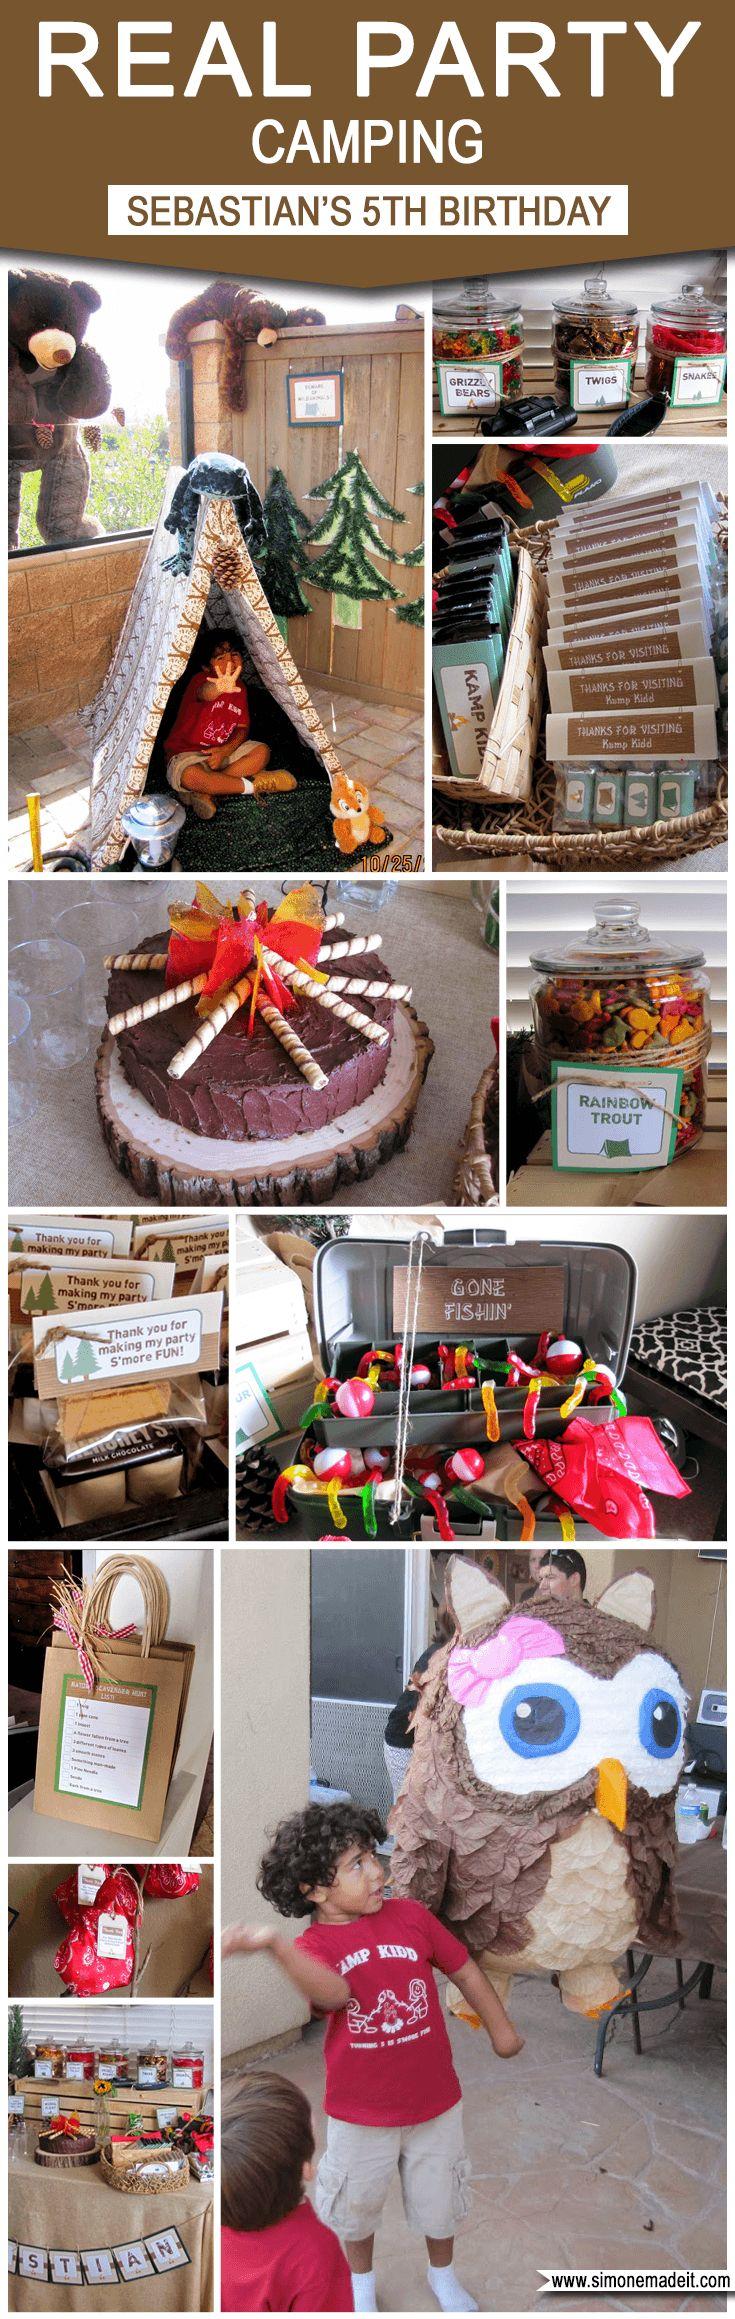 Camping Birthday Party Theme Ideas | Sebastian's 5th Birthday Campout | Camp Birthday Party Ideas & Inspiration